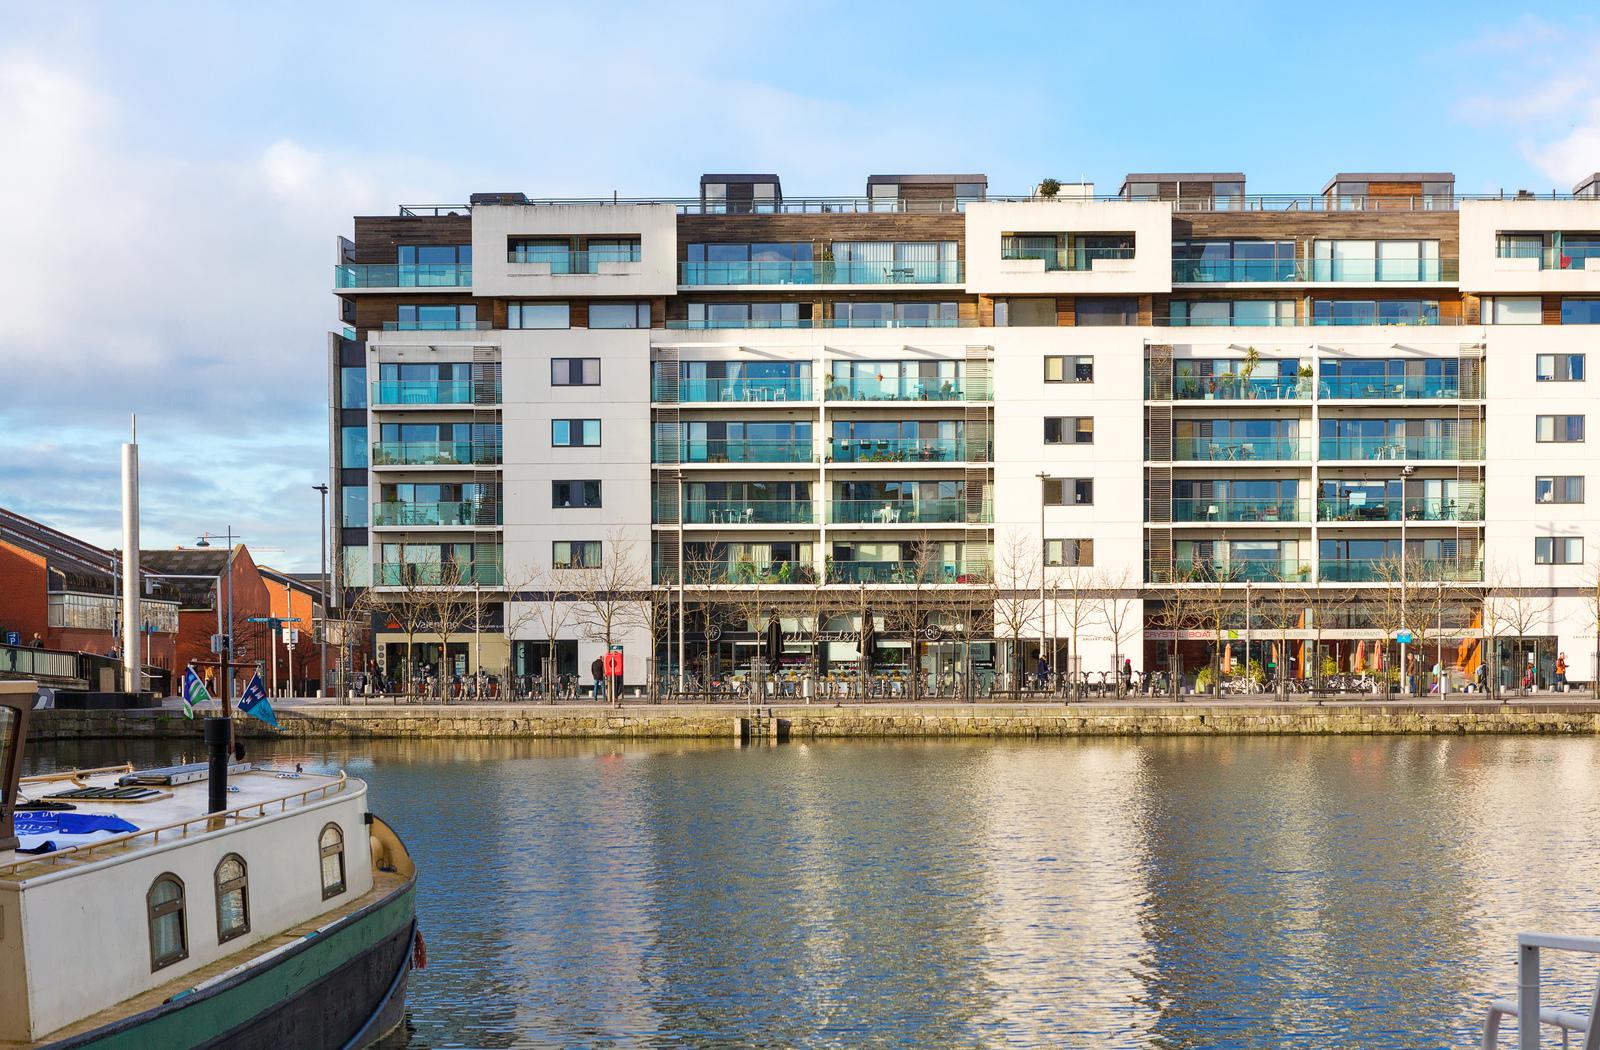 Gallery Quay, Block 3, Grand Canal Dock, Dublin 2.